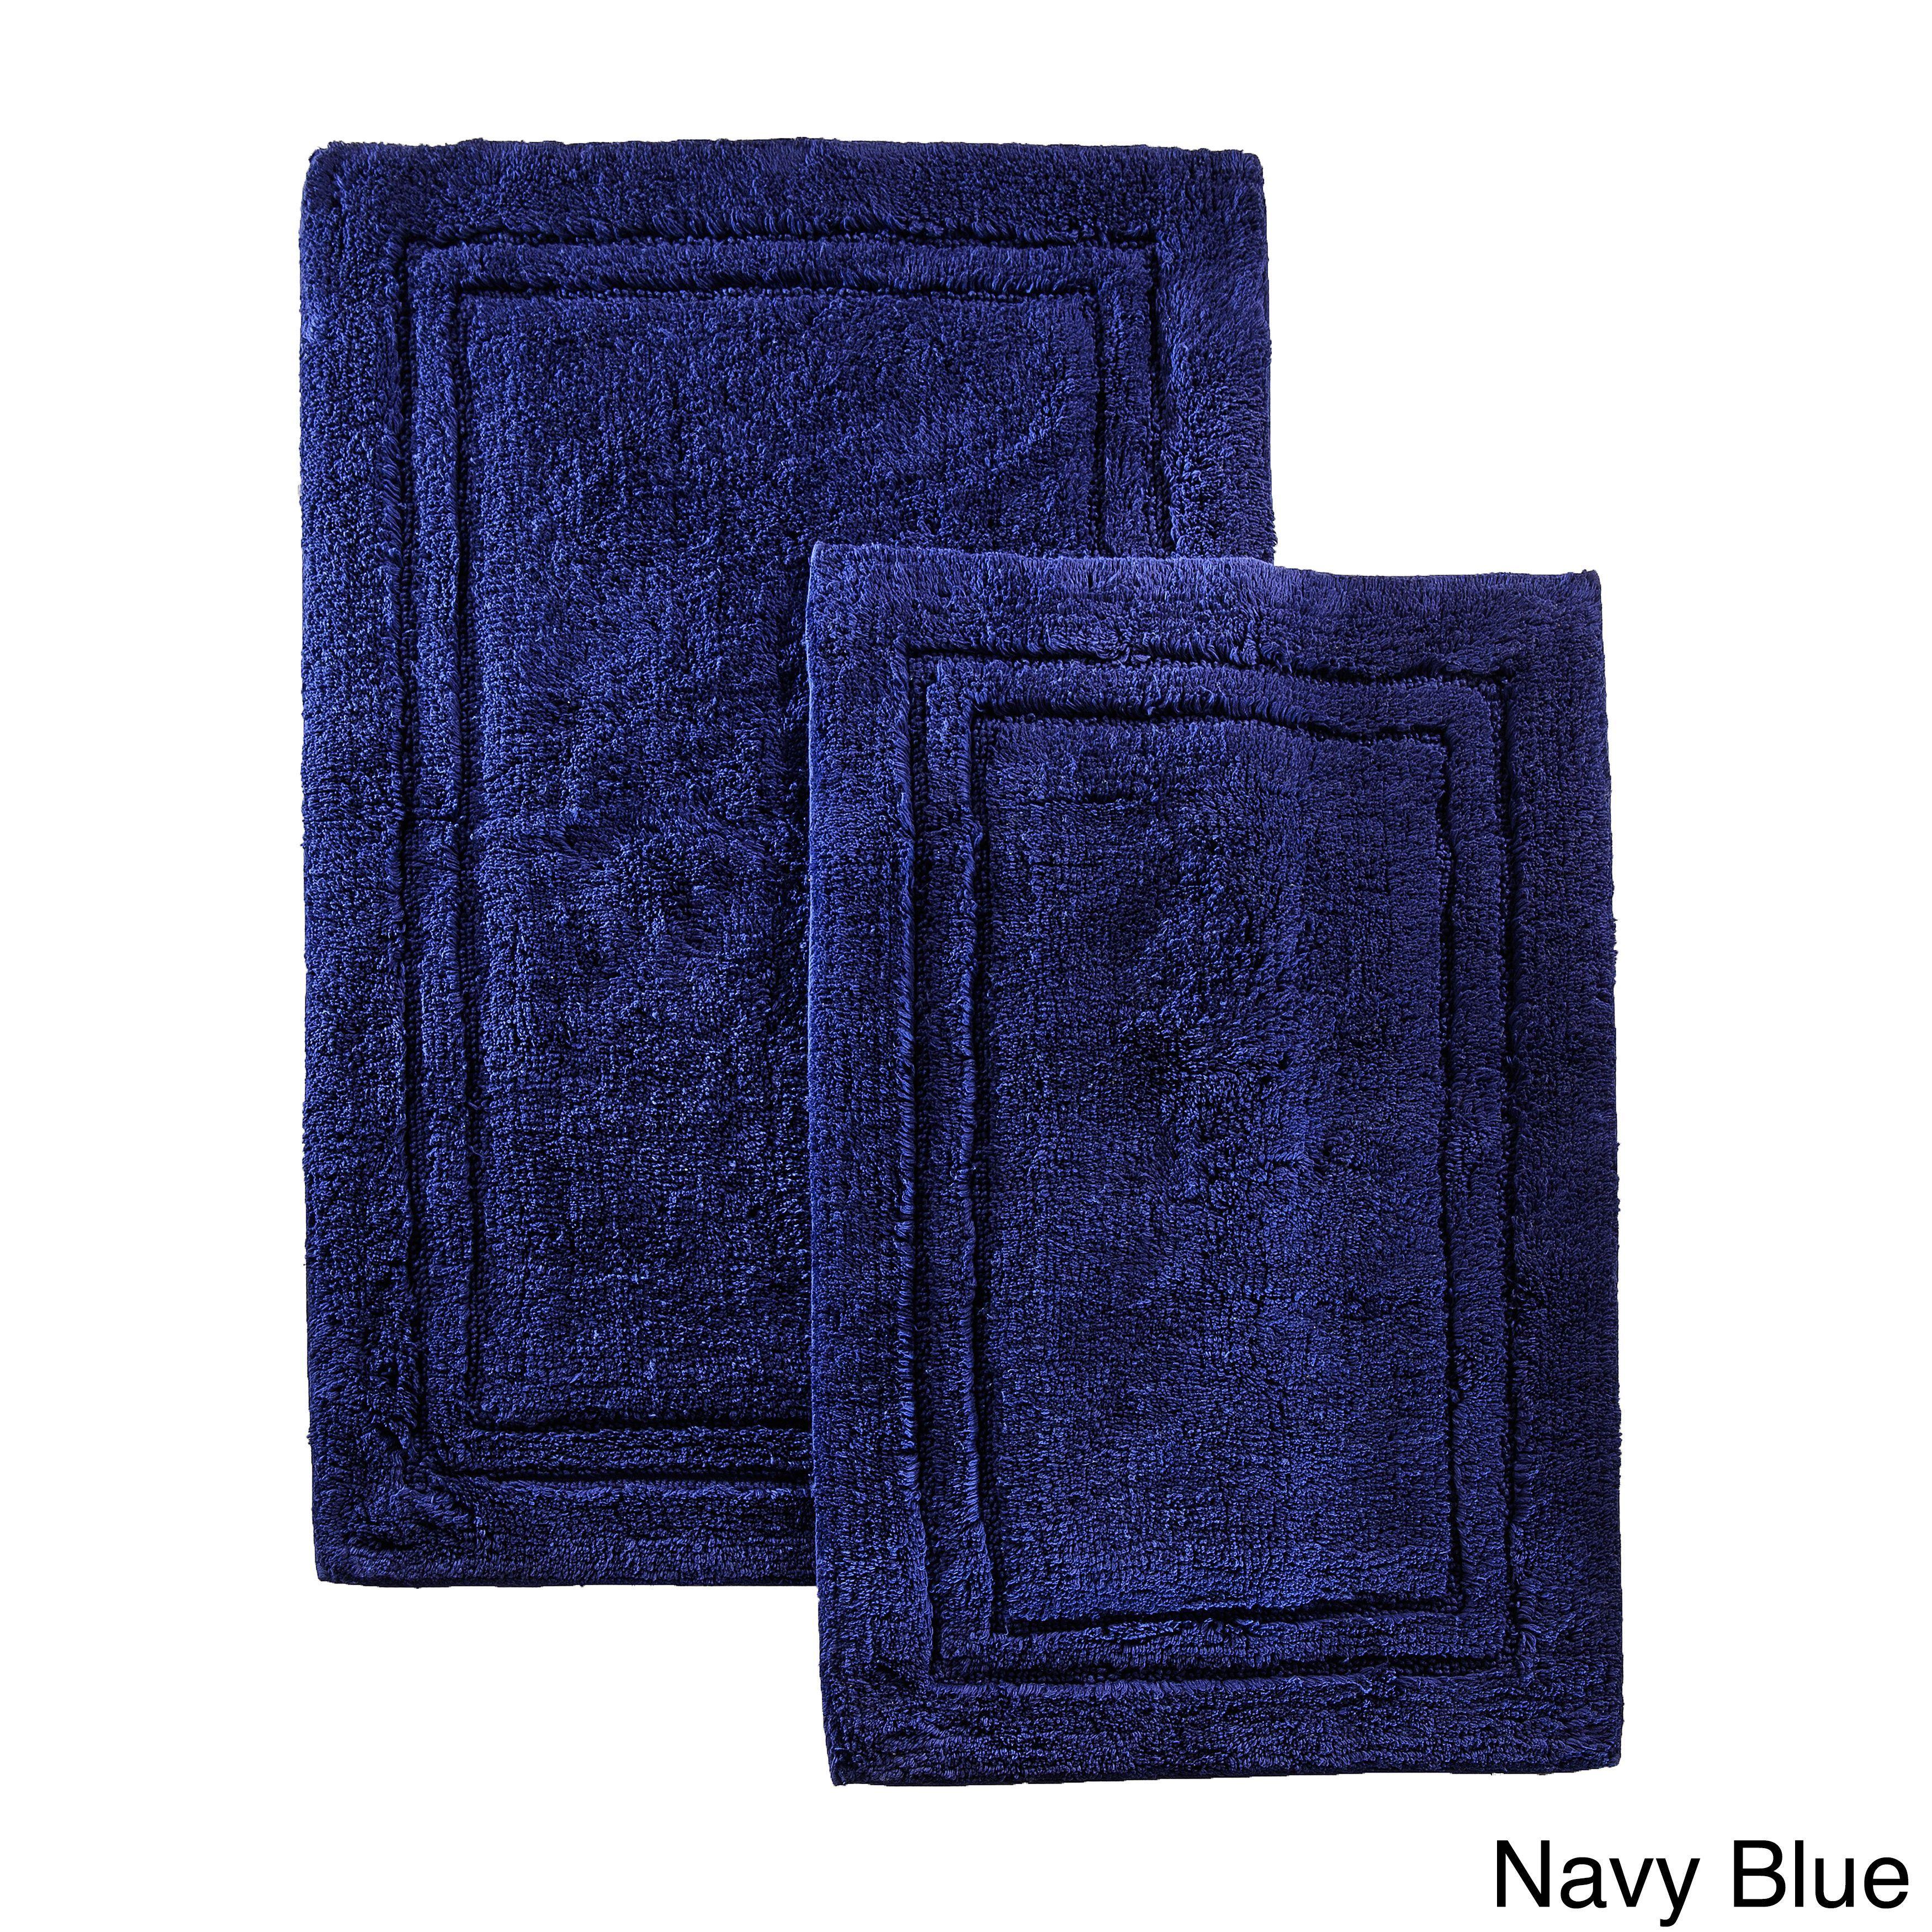 Superior Luxurious Combed Cotton Non Skid Bath Rug Set Set Of 2